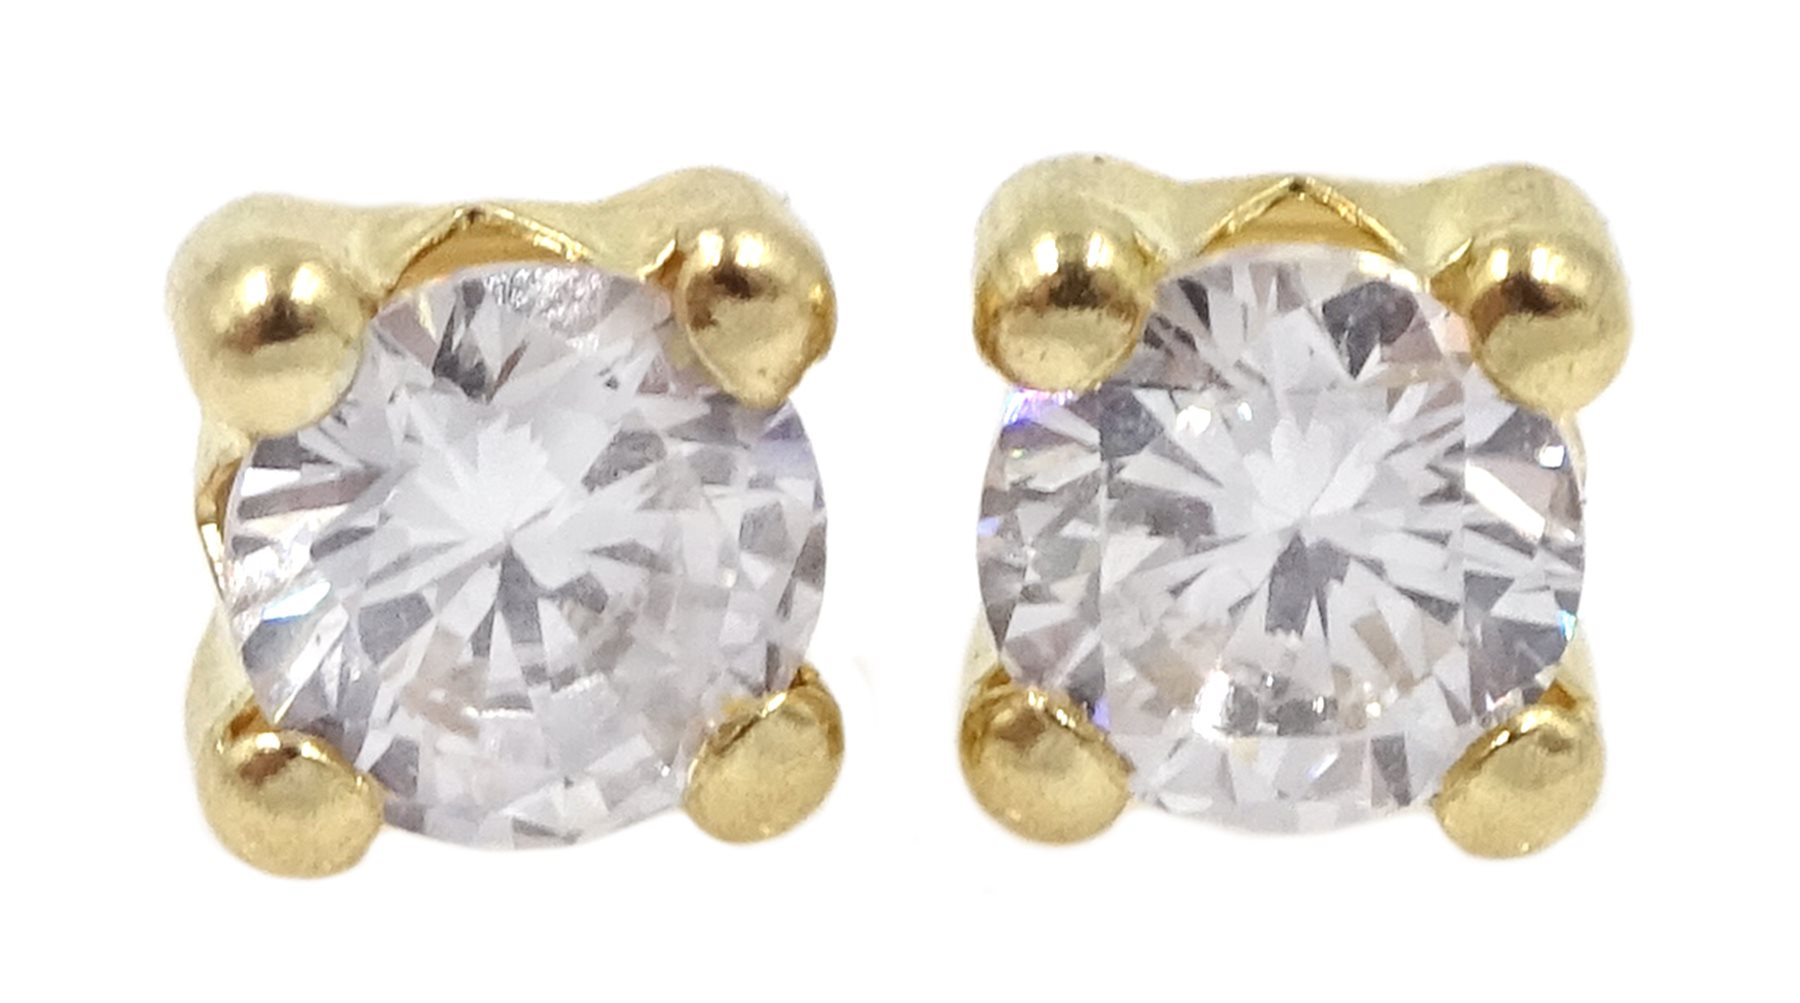 Pair of 9ct gold cubic zirconia stud earrings, stamped 375